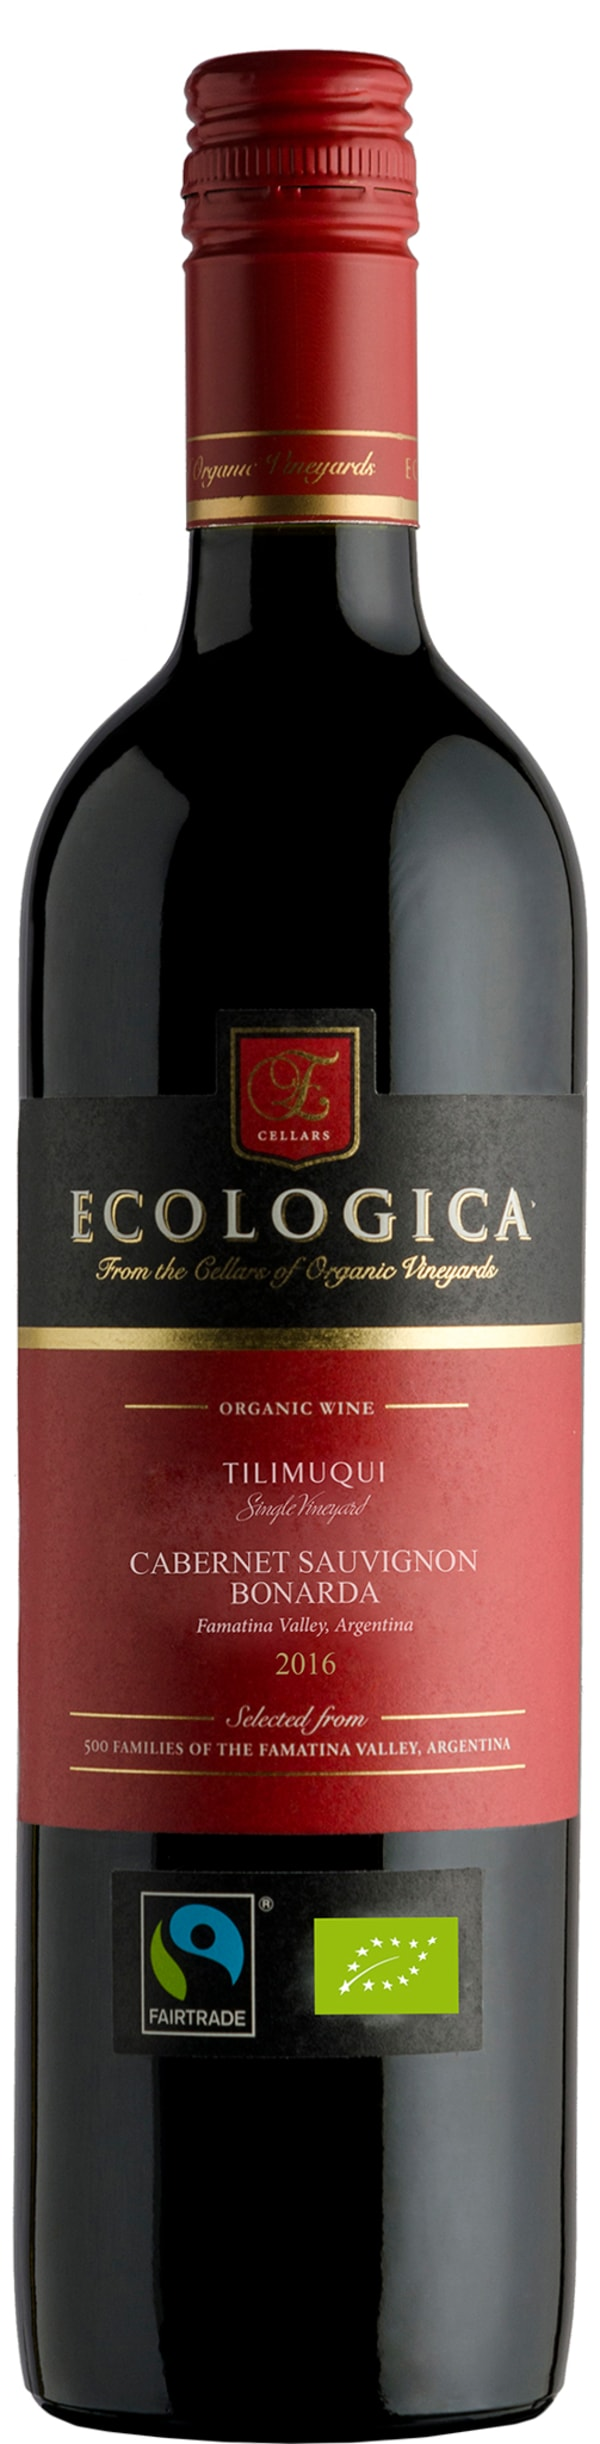 Ecologica Tilimuqui Single Vineyard Cabernet Sauvignon Bonarda  2017